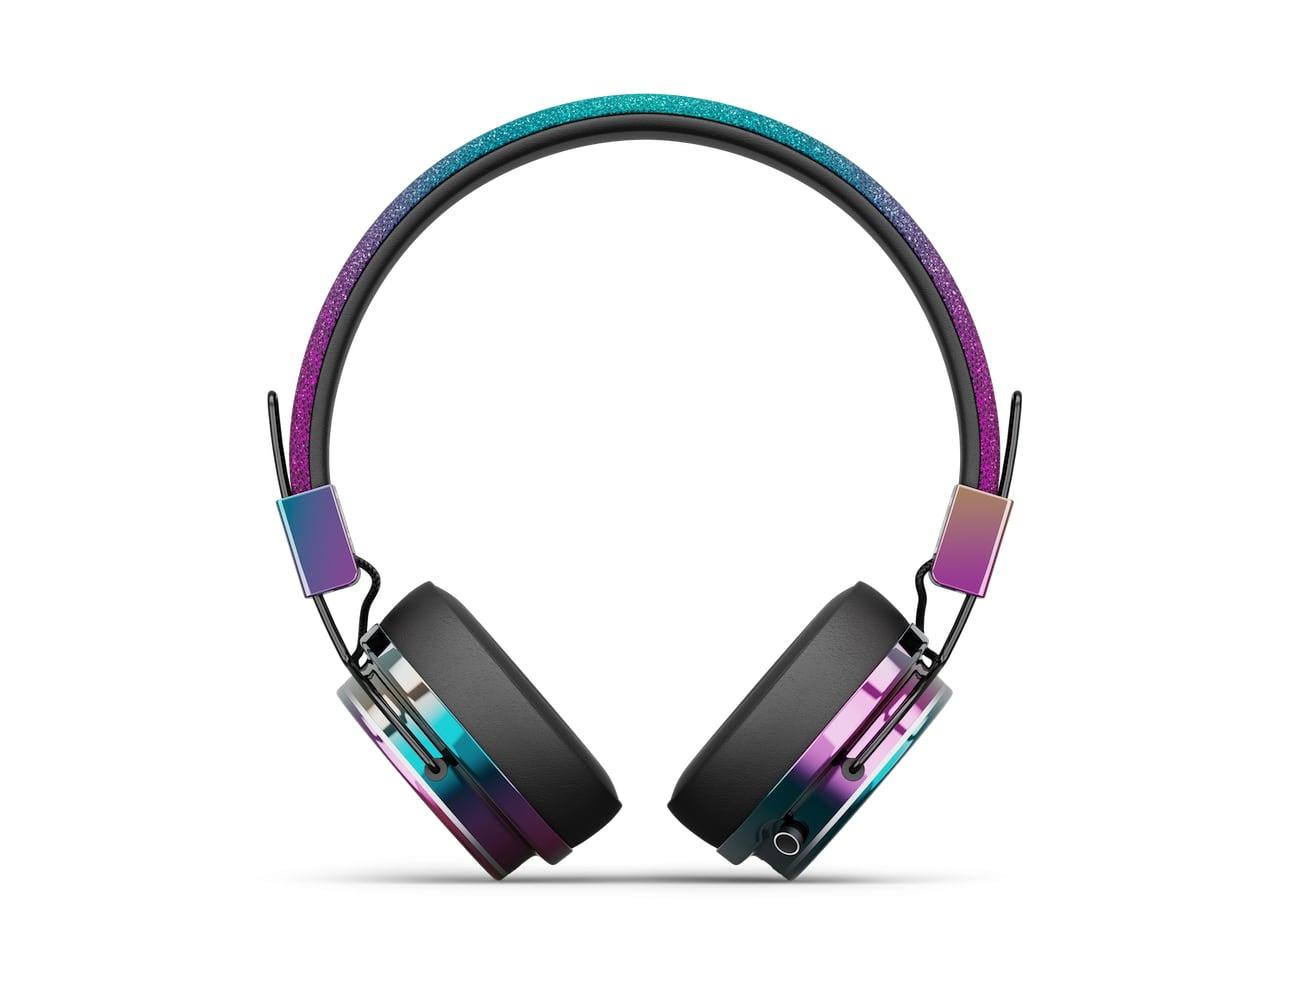 a67467795c16f Urbanears Plattan 2 Bluetooth Tove Lo Edition Headphones have a rainbow  finish